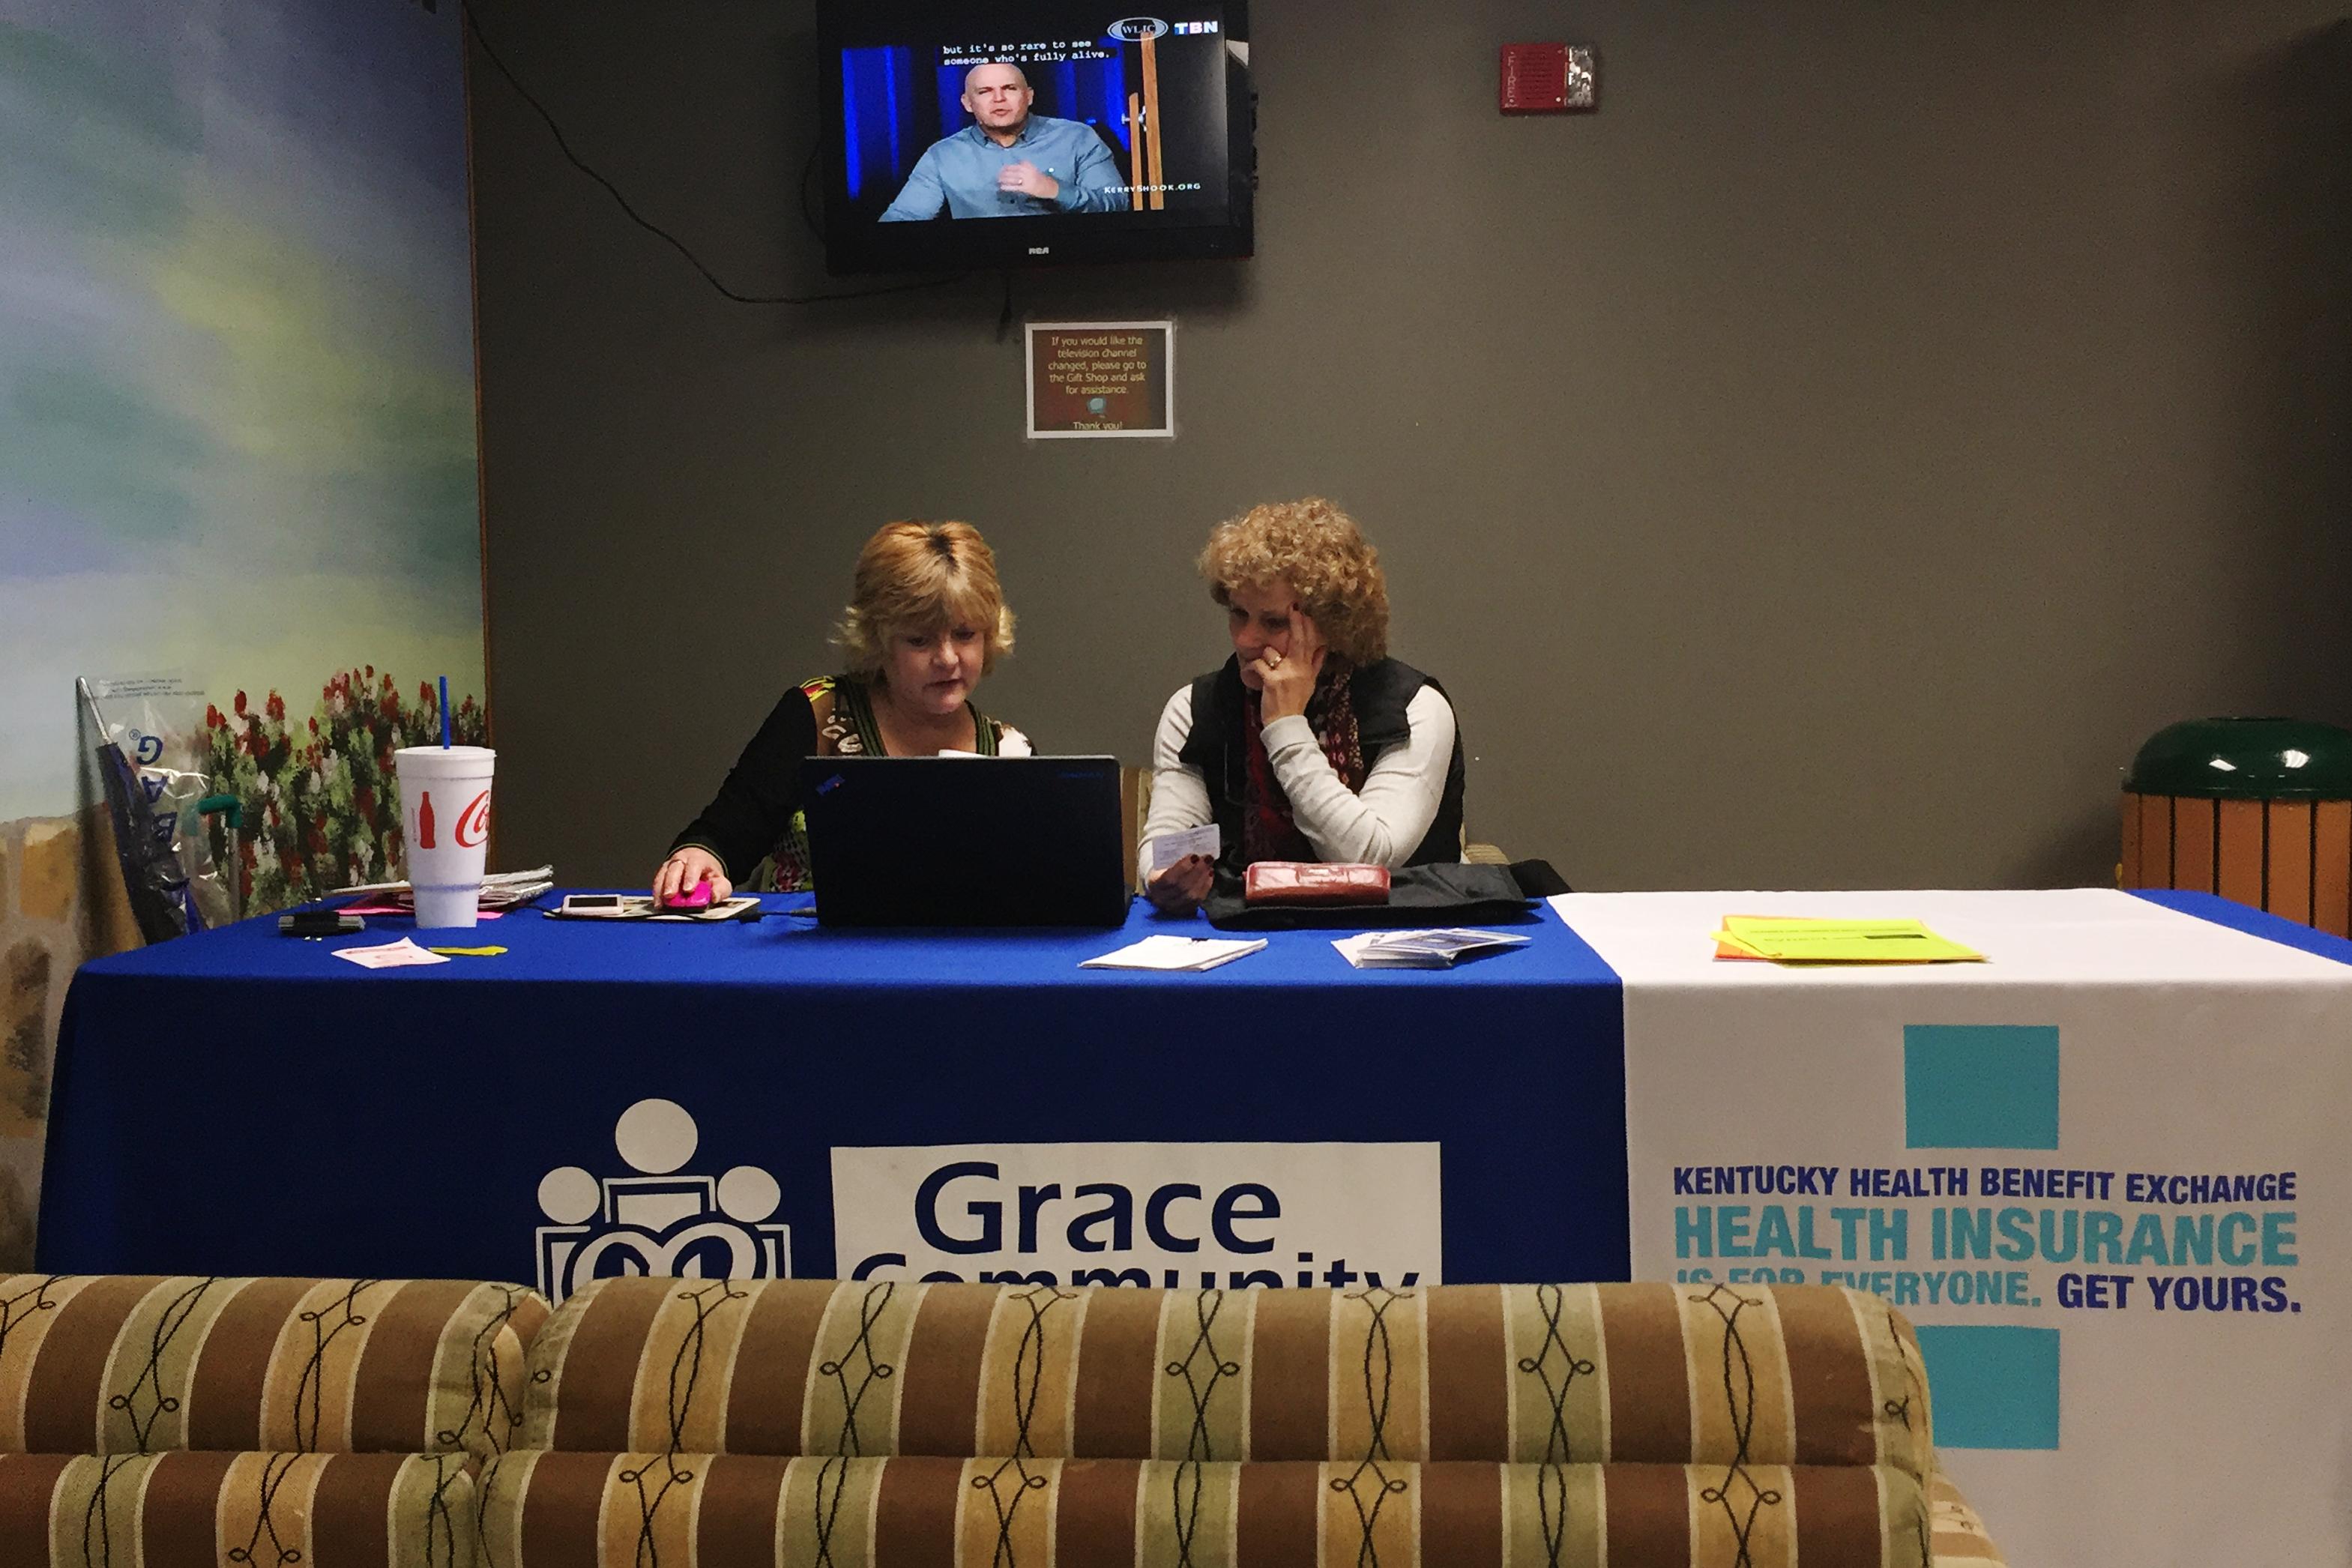 Kathy Oller renewing Debbie Mills' Obamacare coverage.